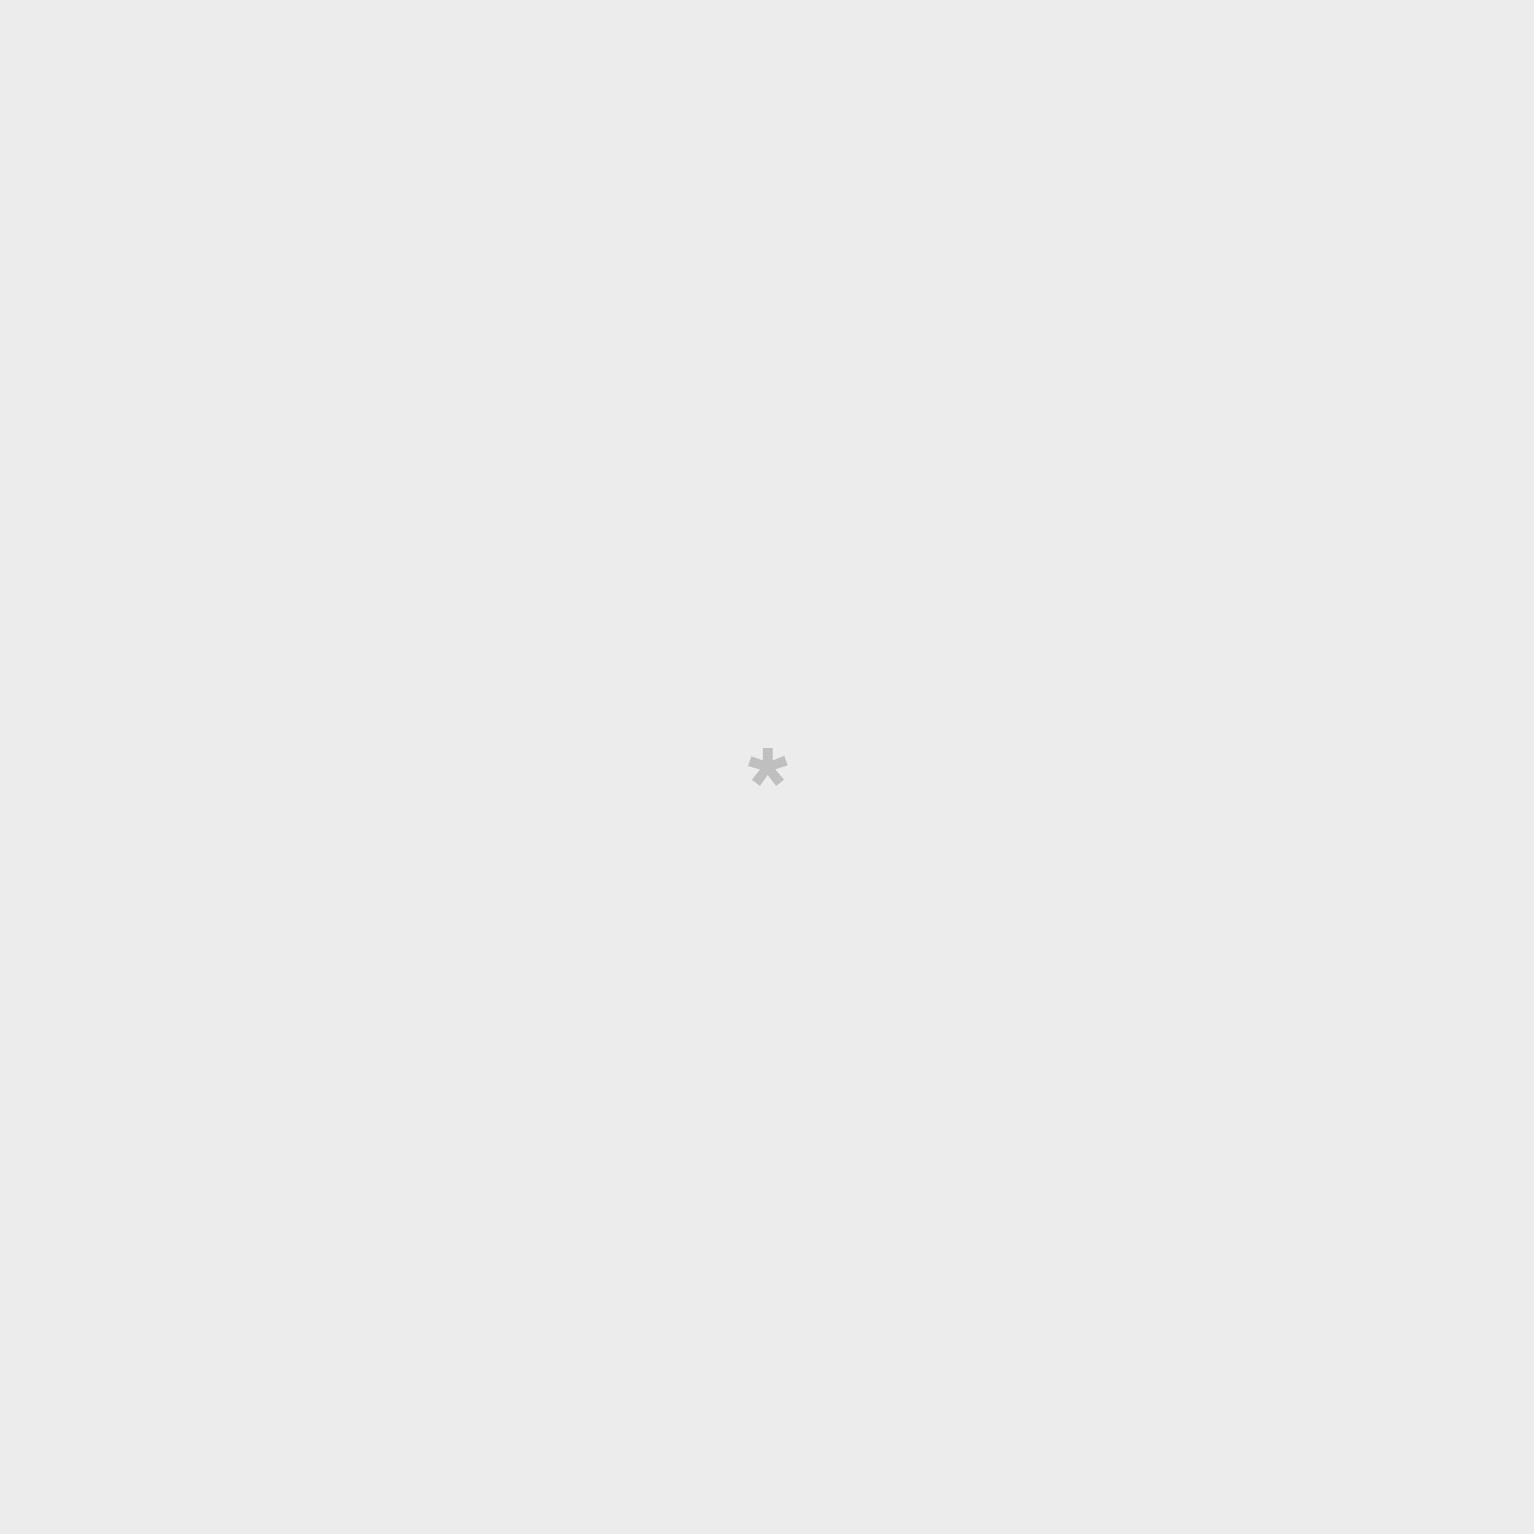 iPhone 12 Pro / iPhone 12 Max MR phone case - Make good memories